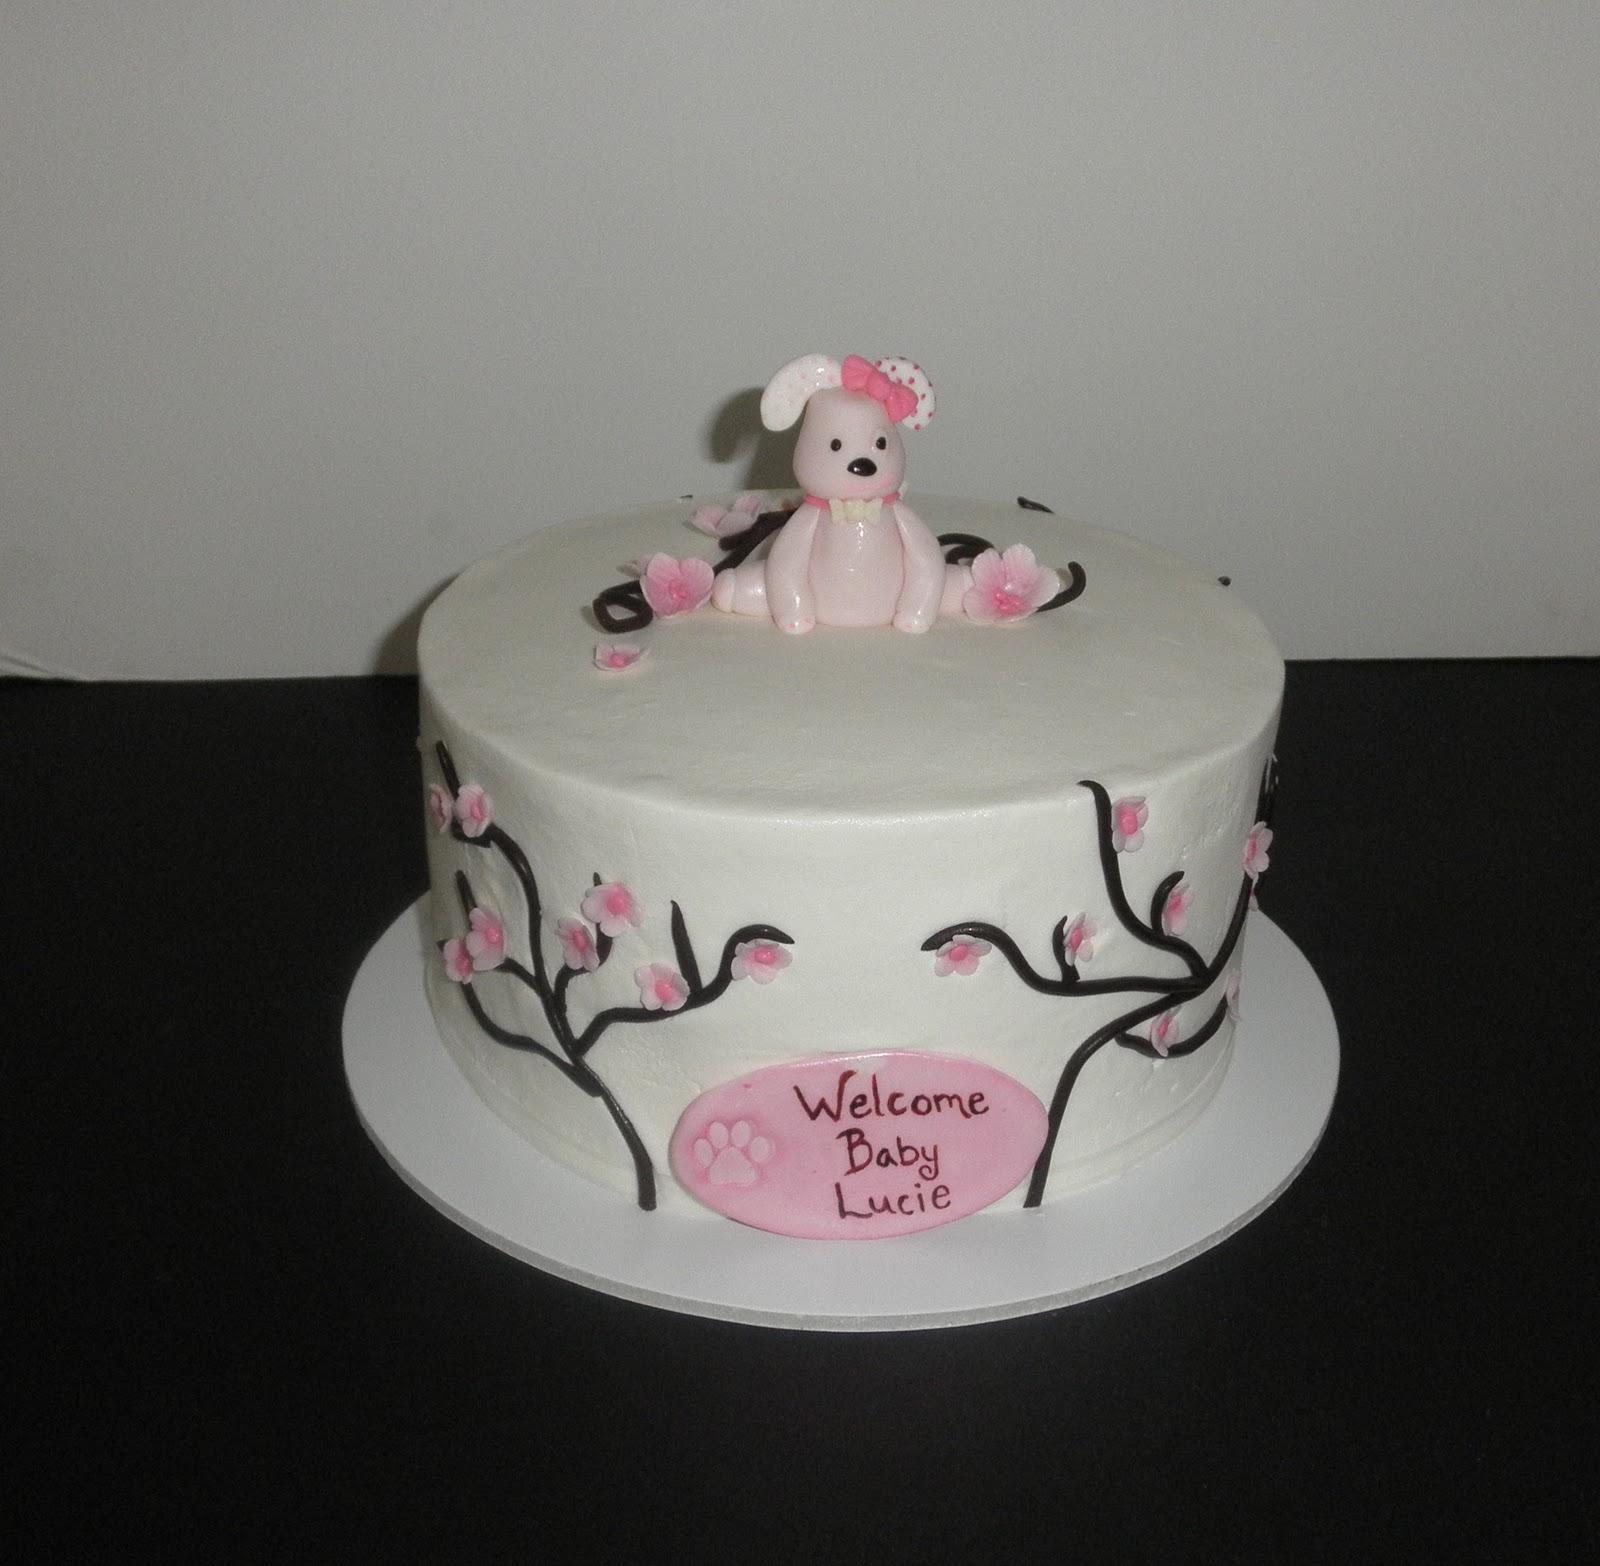 Sweet T s Cake Design Cherry Blossom Pink Puppy Baby Shower Cake